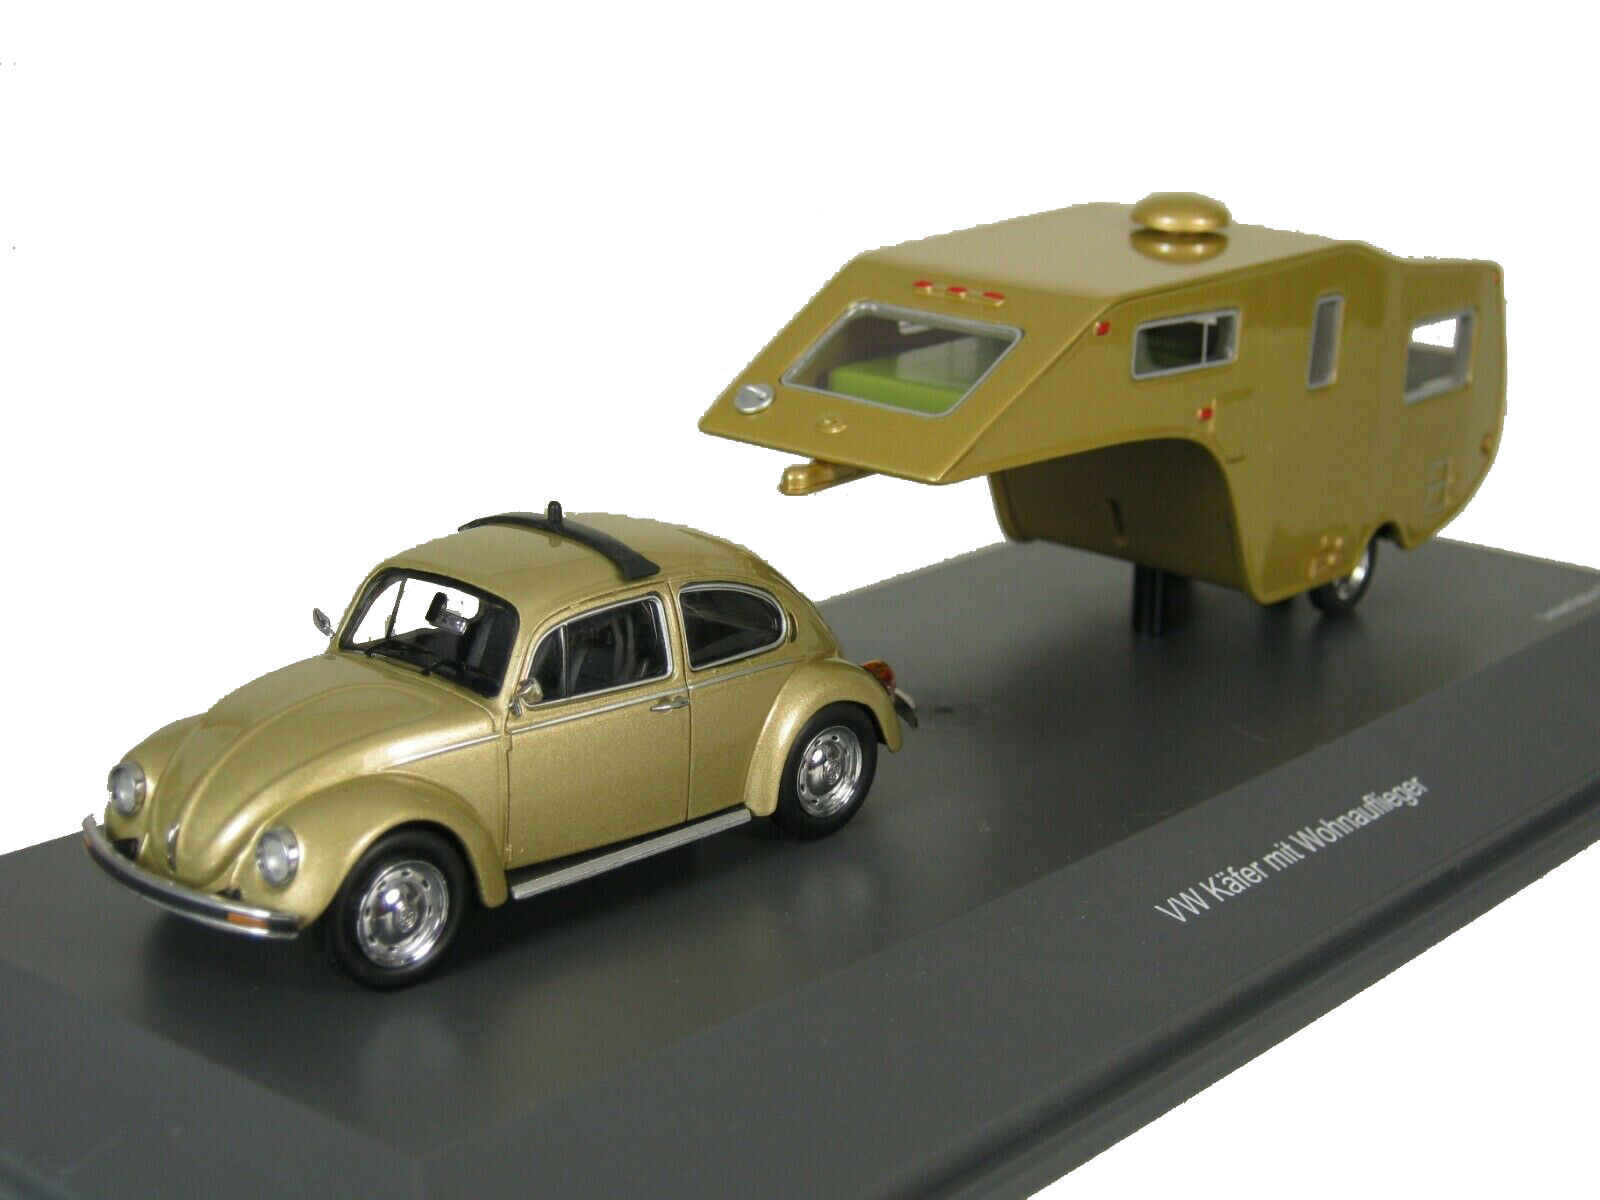 Schuco 1 43 Volkswagen 1200 con Remolque Cocheavana oro 450903800